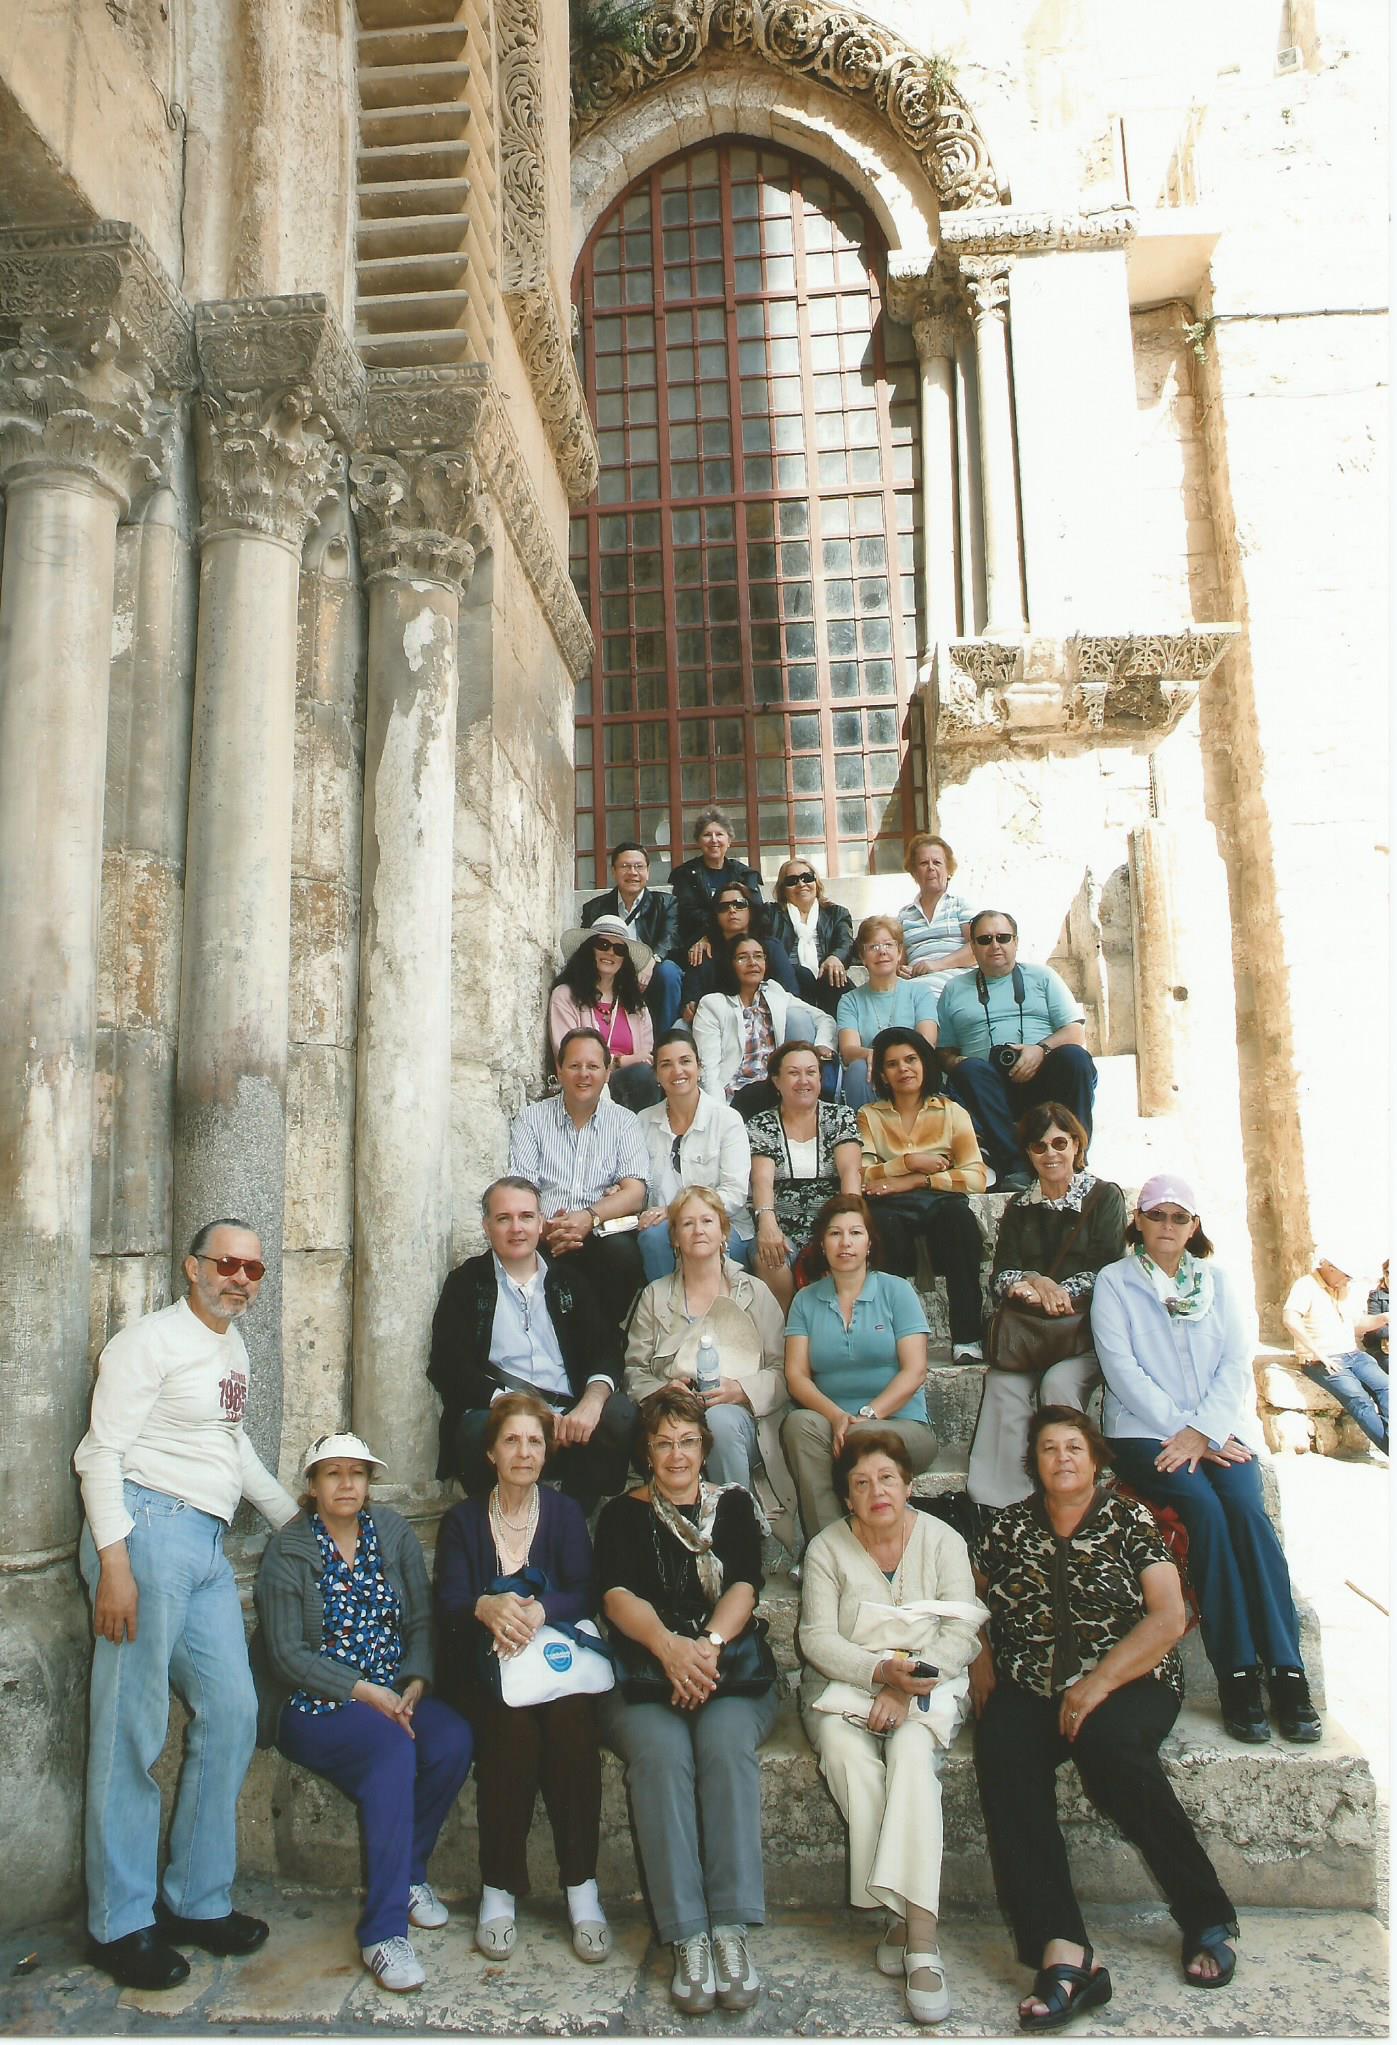 Metodista 2009 - Terra Santa